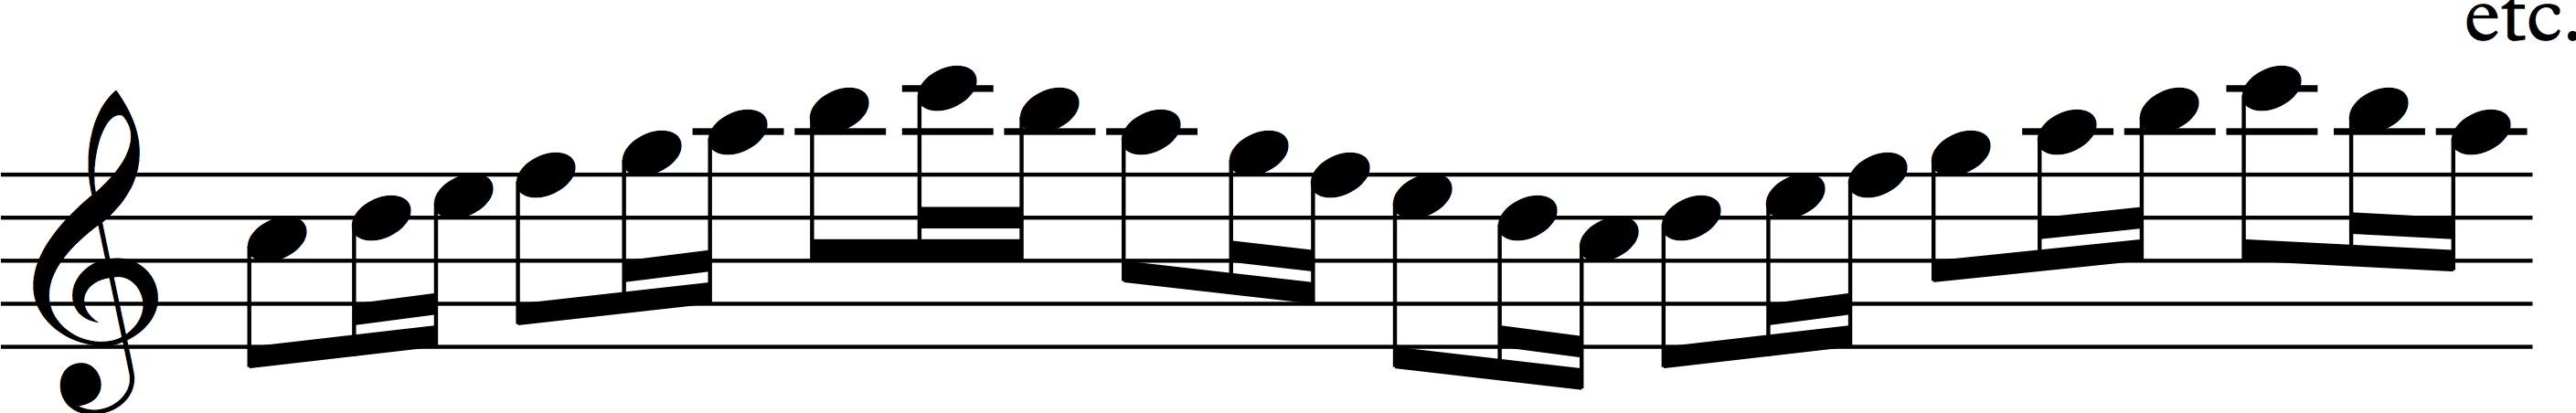 Scale 3 rhtyhm 2.jpg